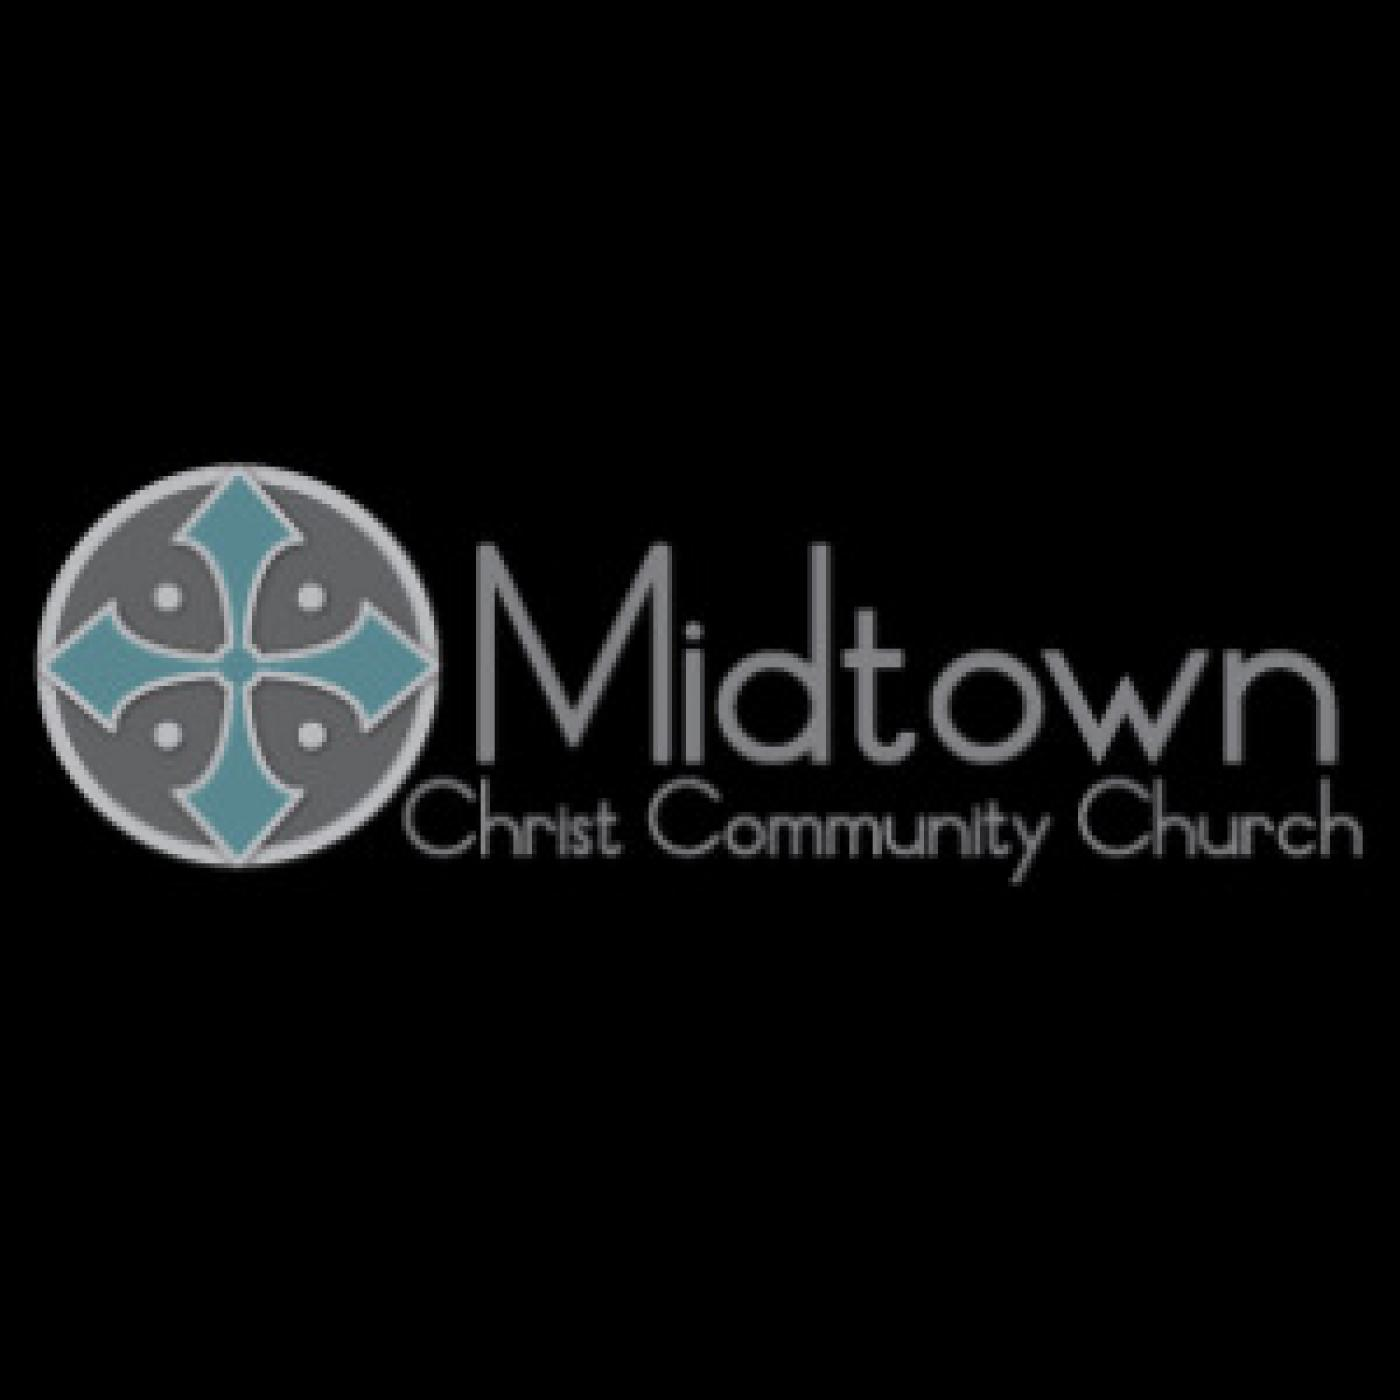 Midtown Church